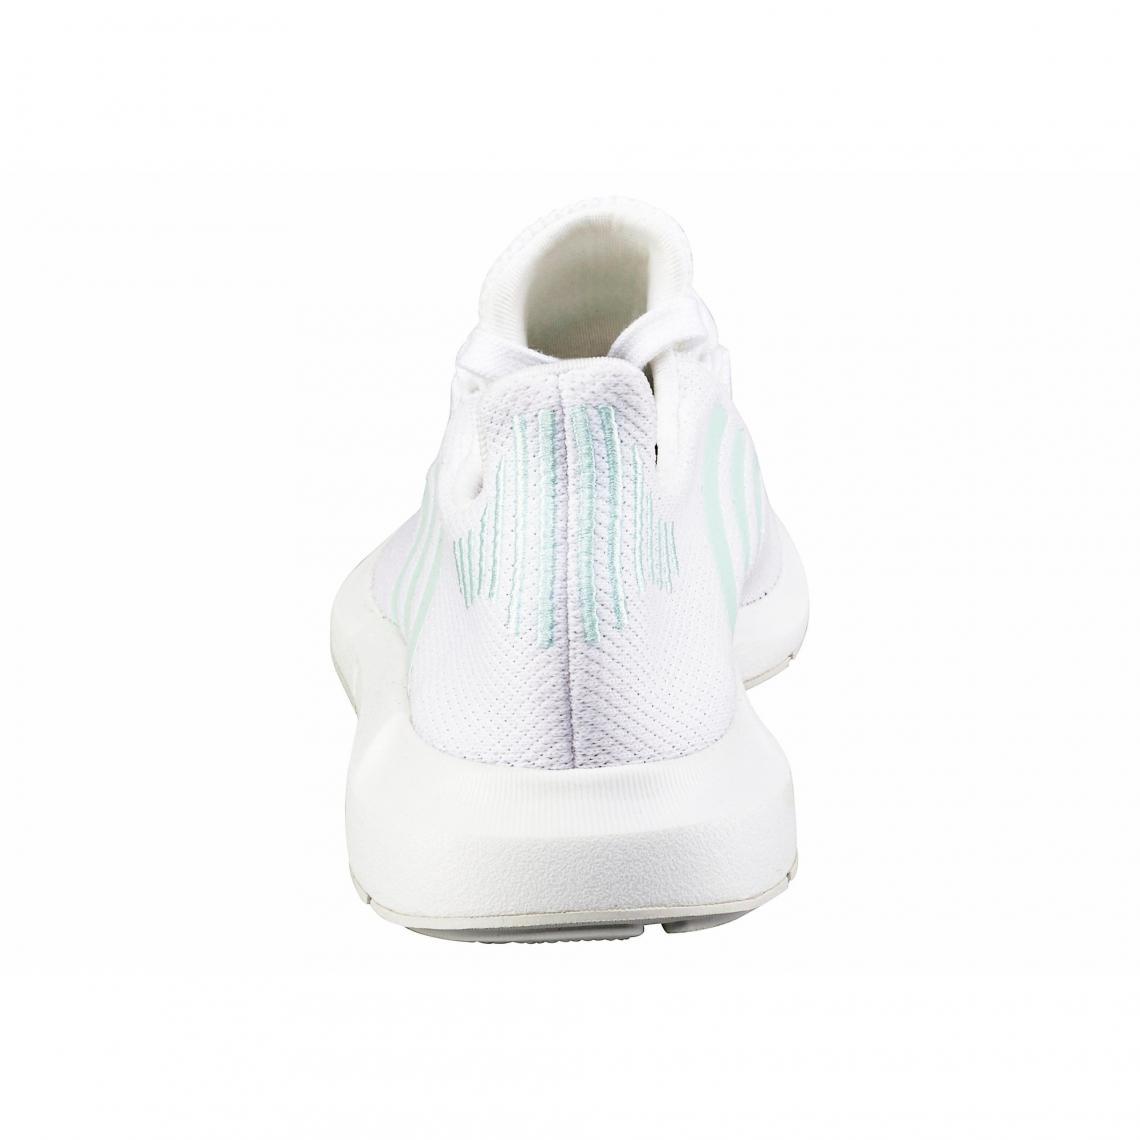 ece242e498 Sneakers Adidas Originals Cliquez l'image pour l'agrandir. adidas Originals  Swift Run chaussures running femme - Blanc ...